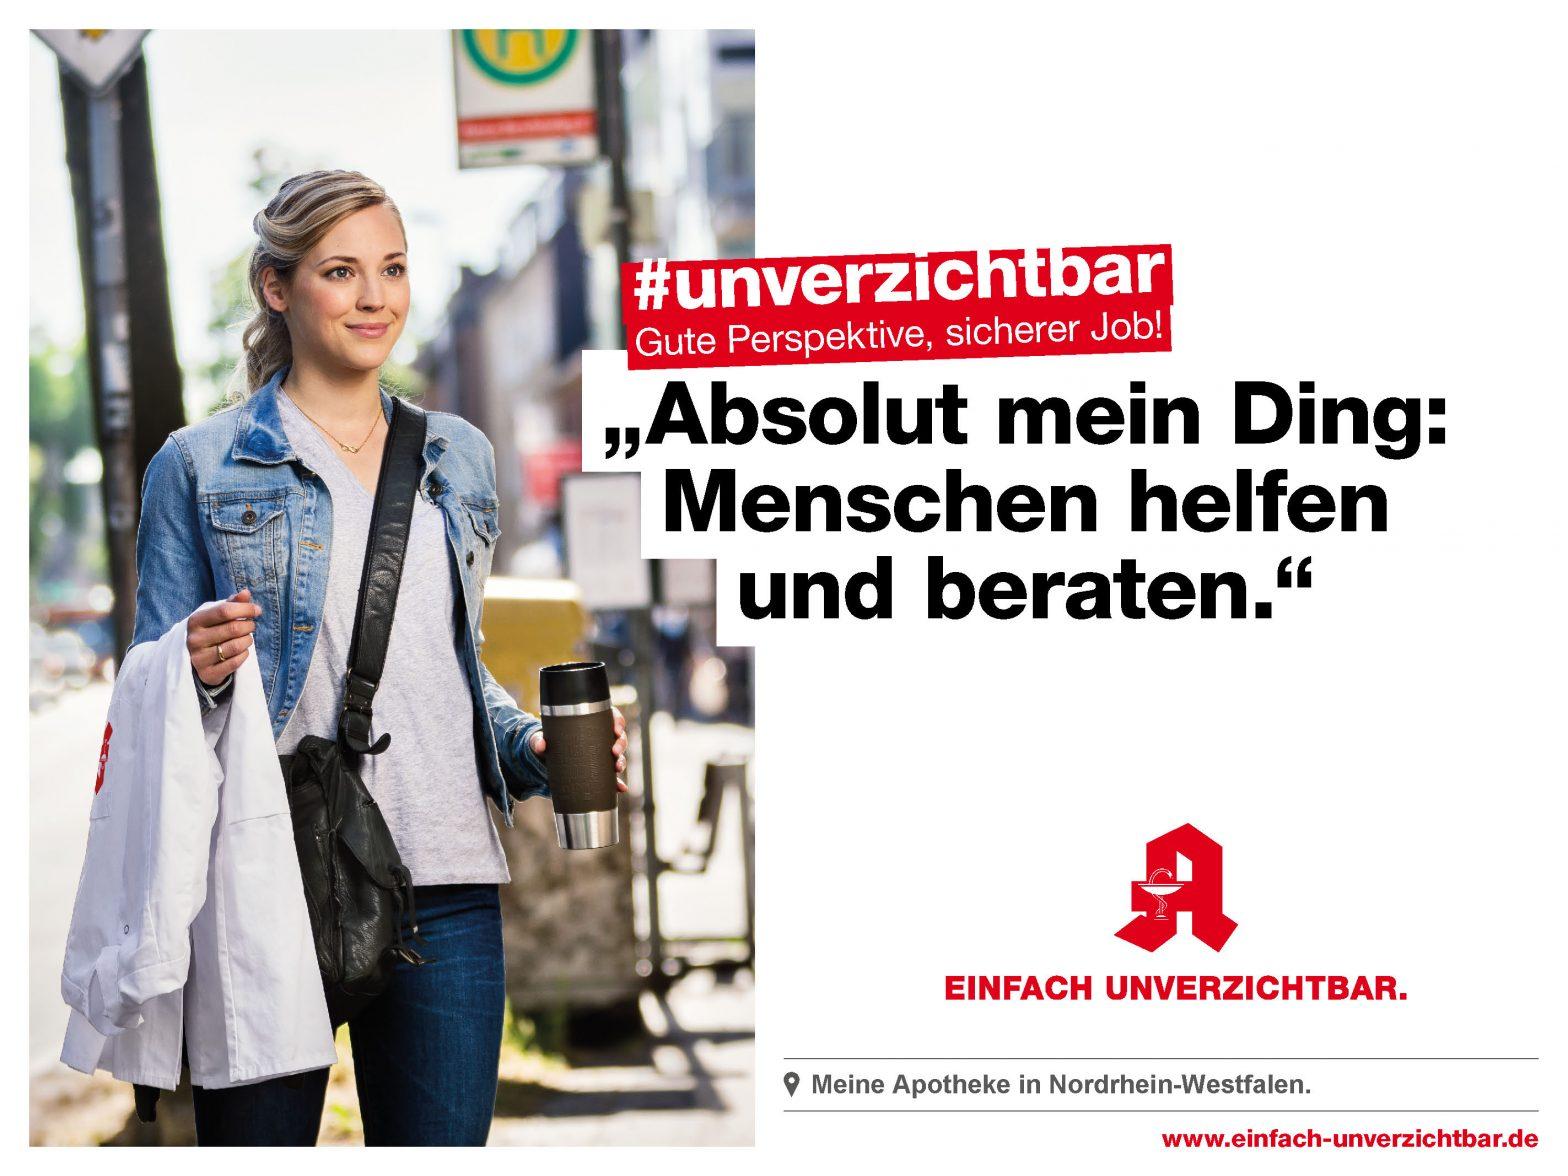 Infoscreen #unverzichtbar - Nachwuchs